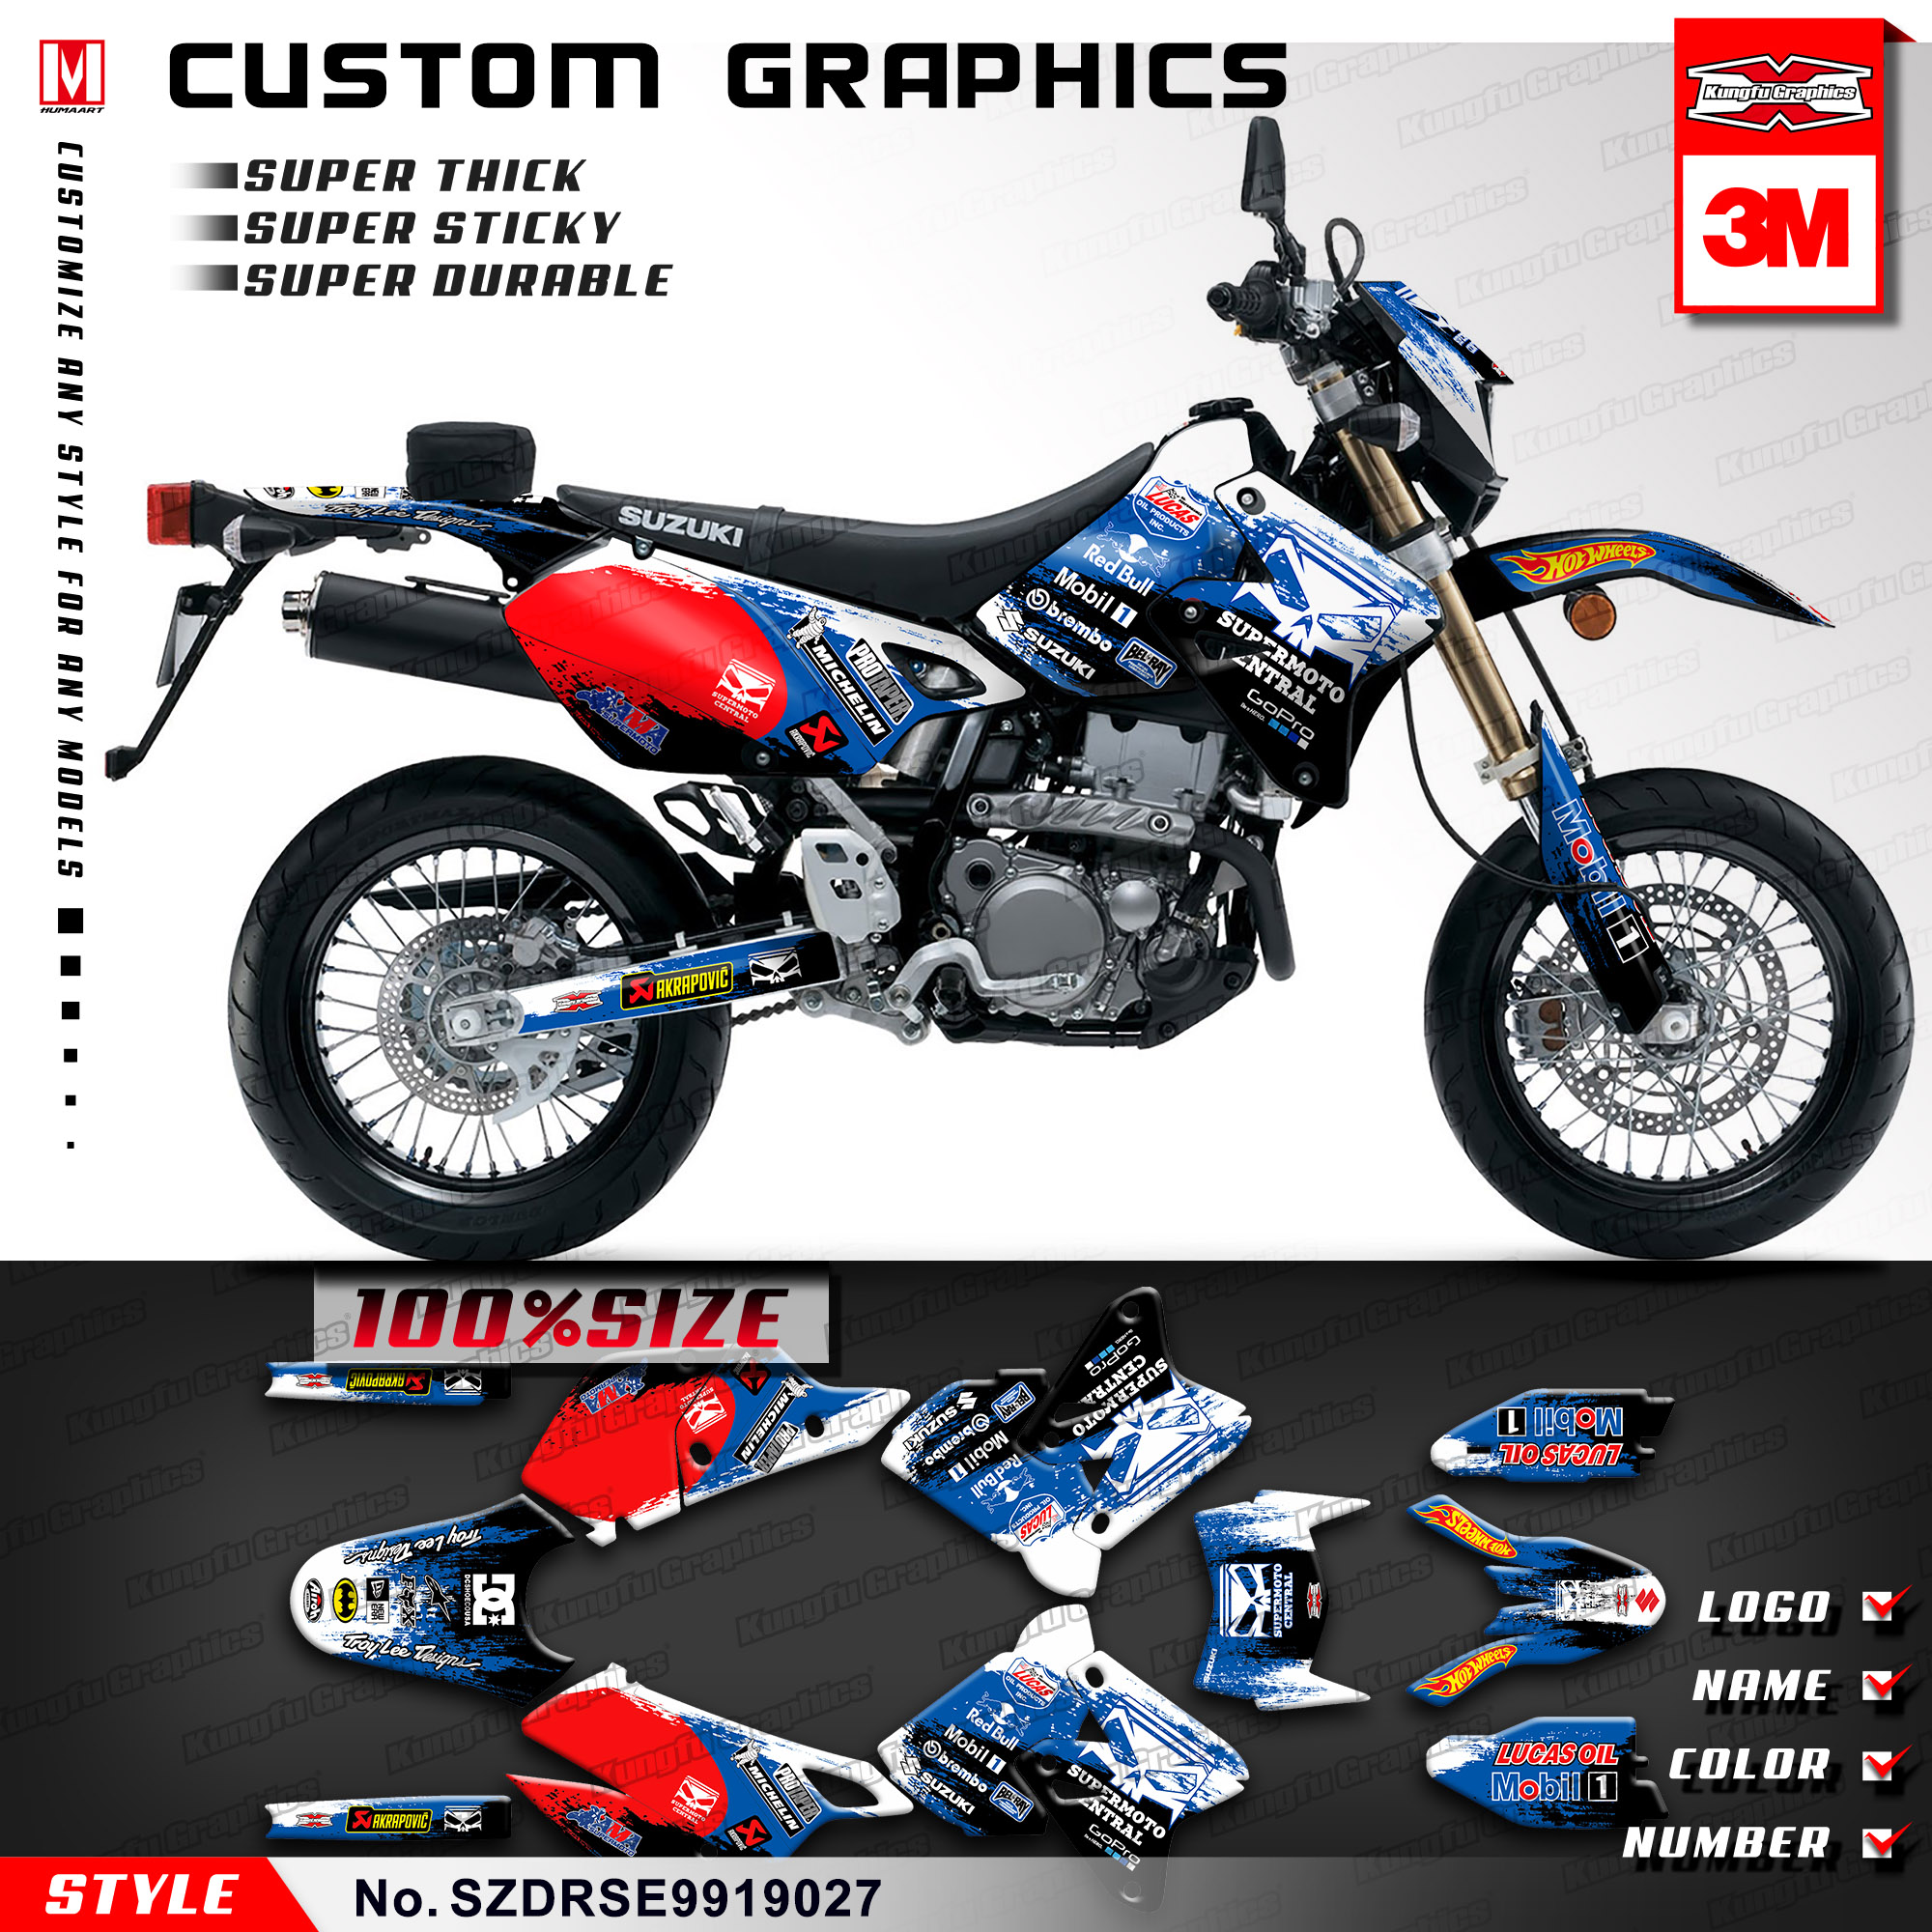 HUSABERG Graphics Kit Decals Design Stickers FS 450 550 650 2006 2007 2008 MX